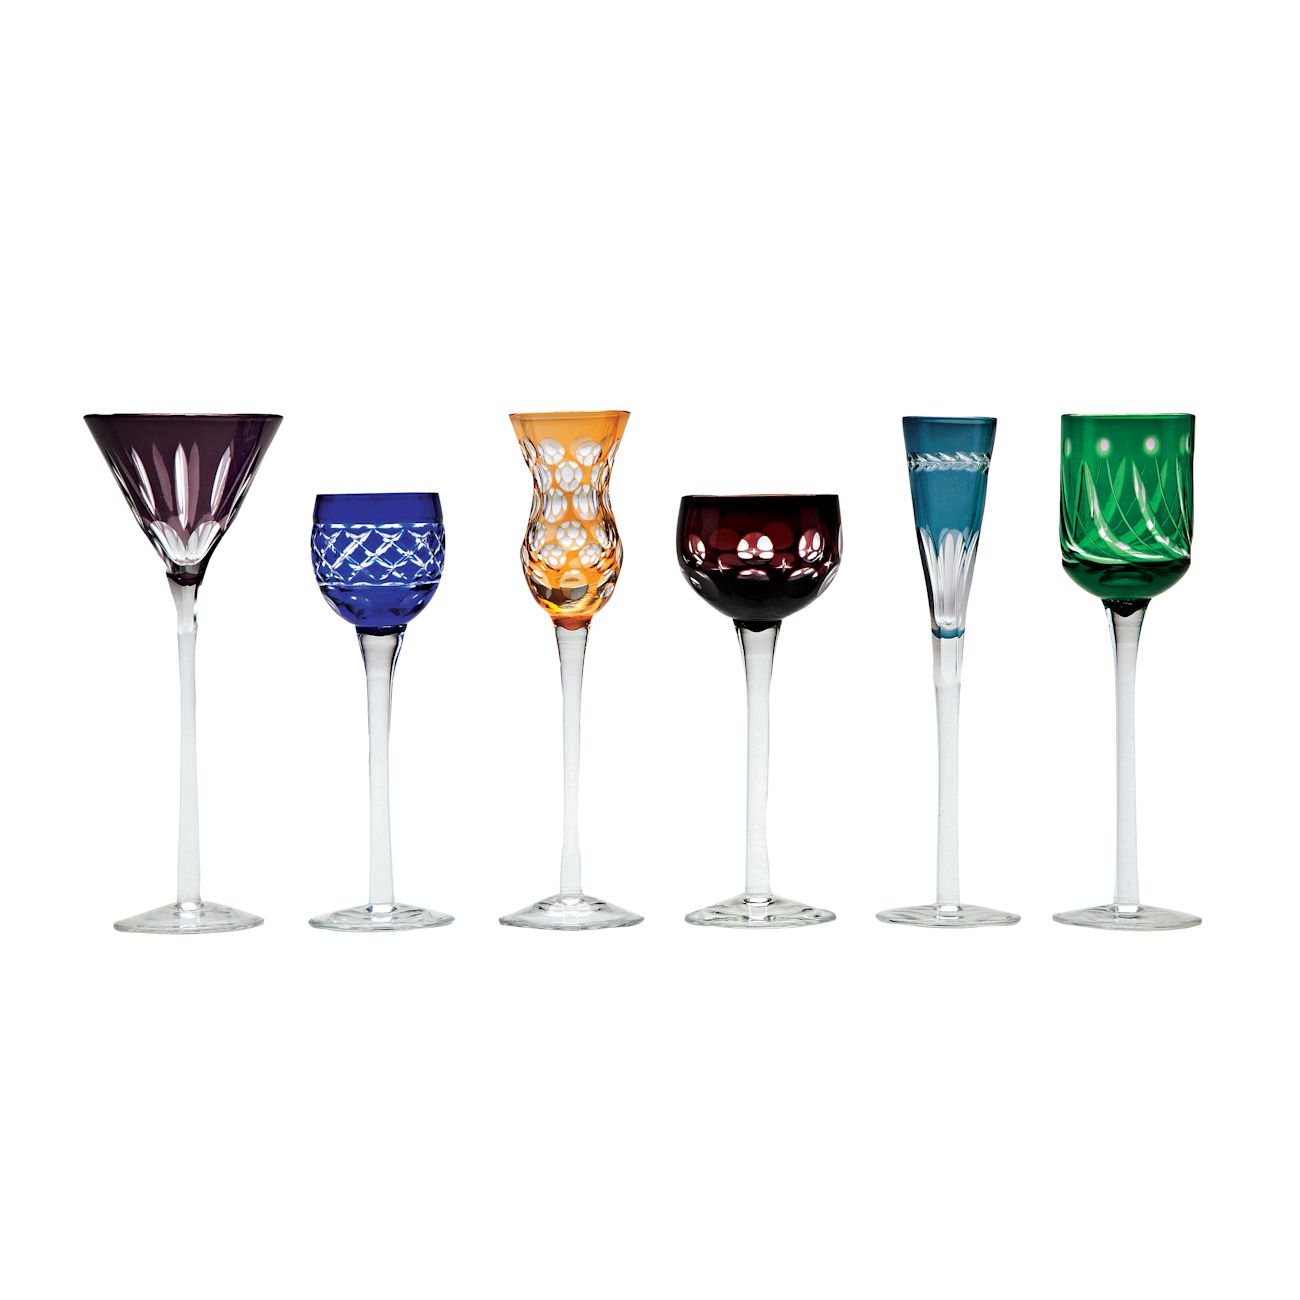 Conjunto 6 Taças para Licor Lapidadas de Cristal 150ml